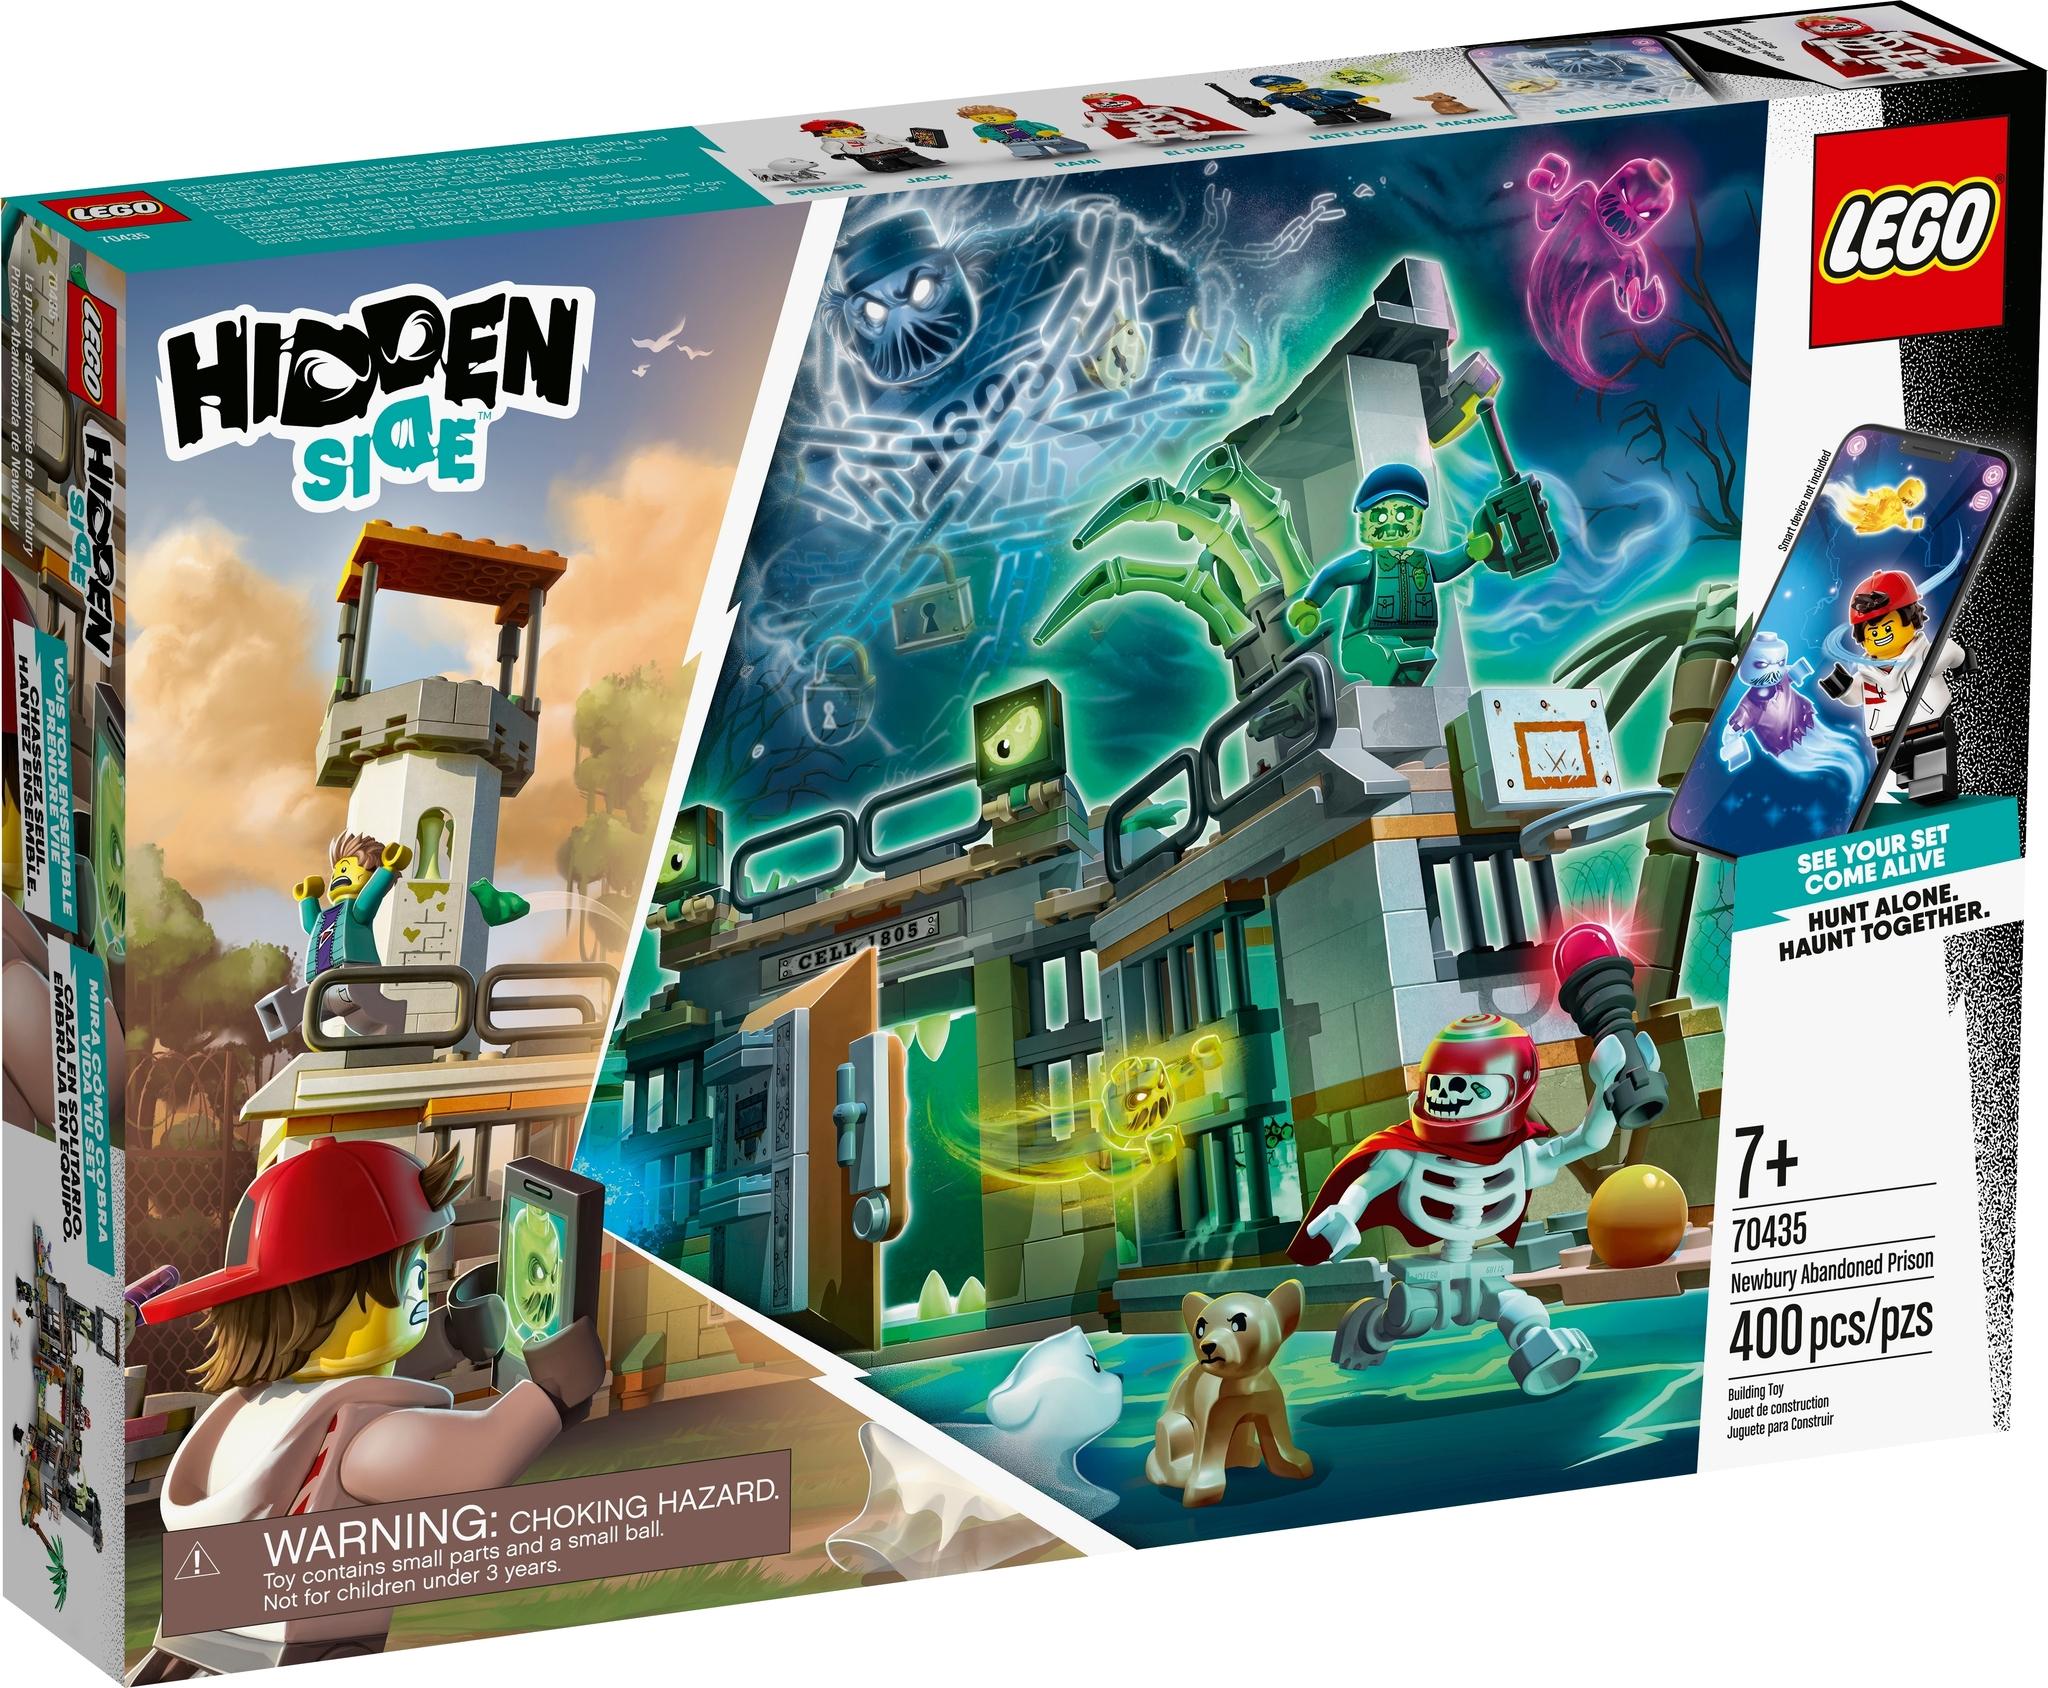 LEGO - Hidden Side